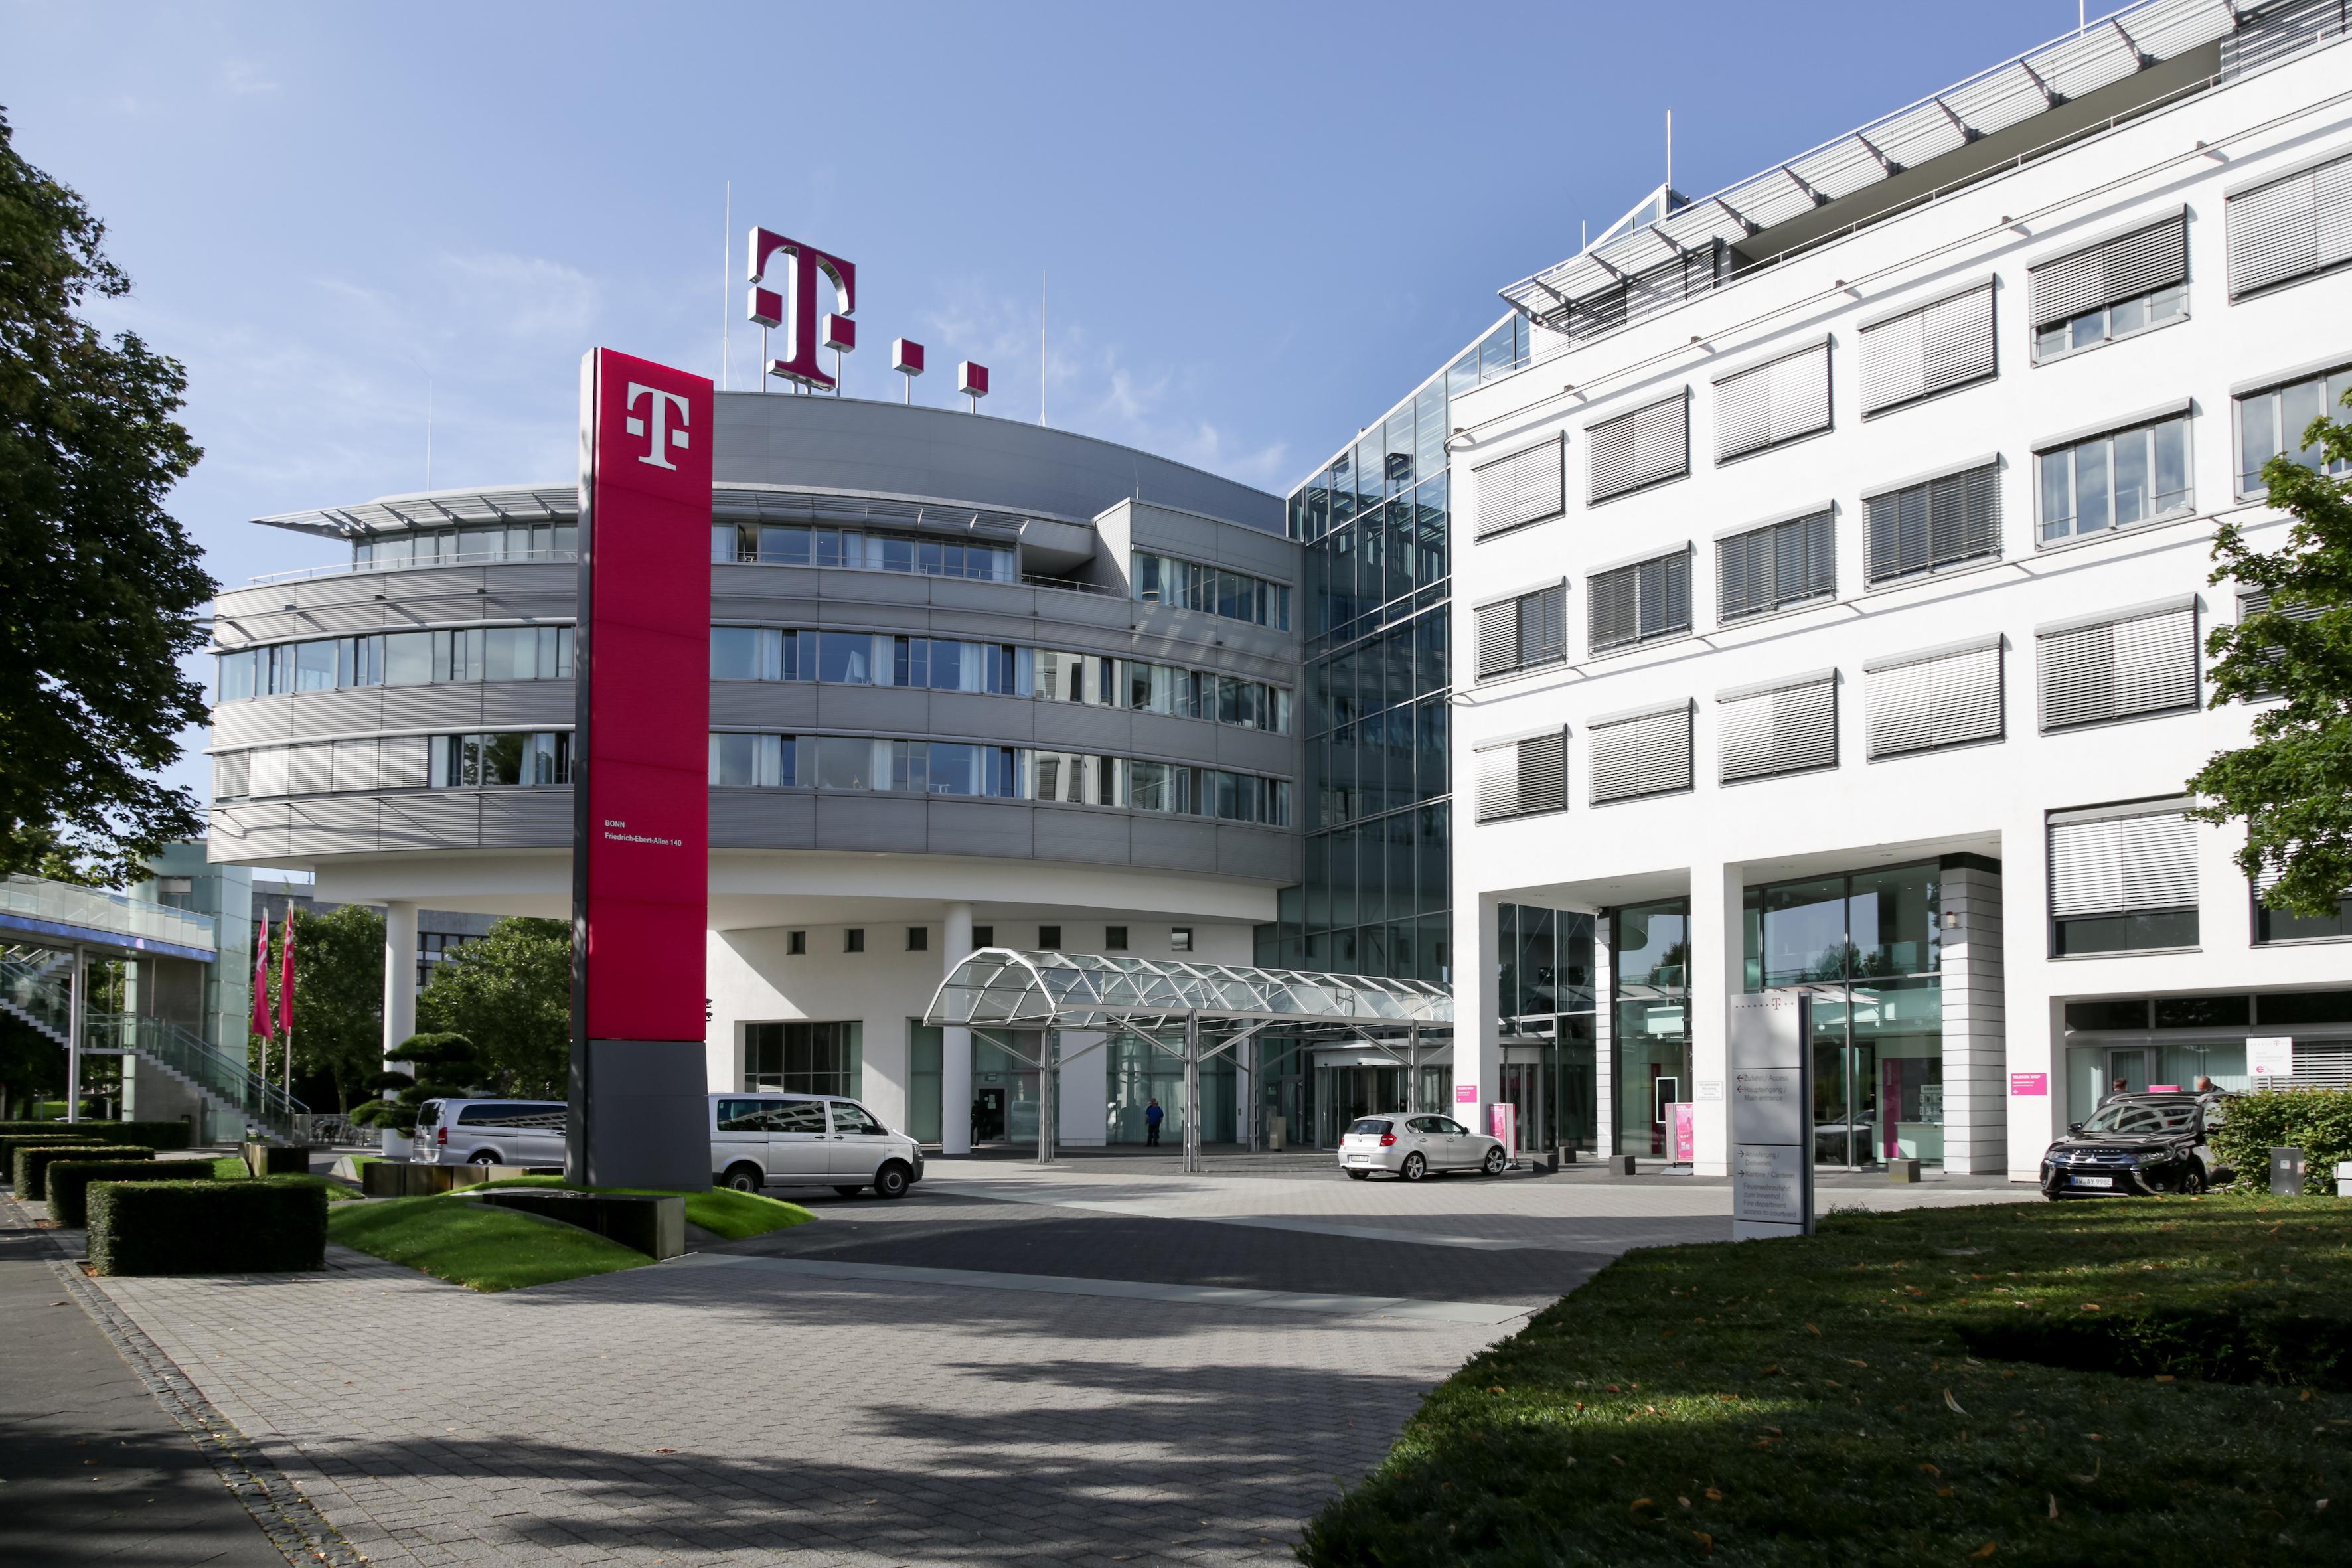 Telekom zeigt sich unflexibel (Foto: Telekom)